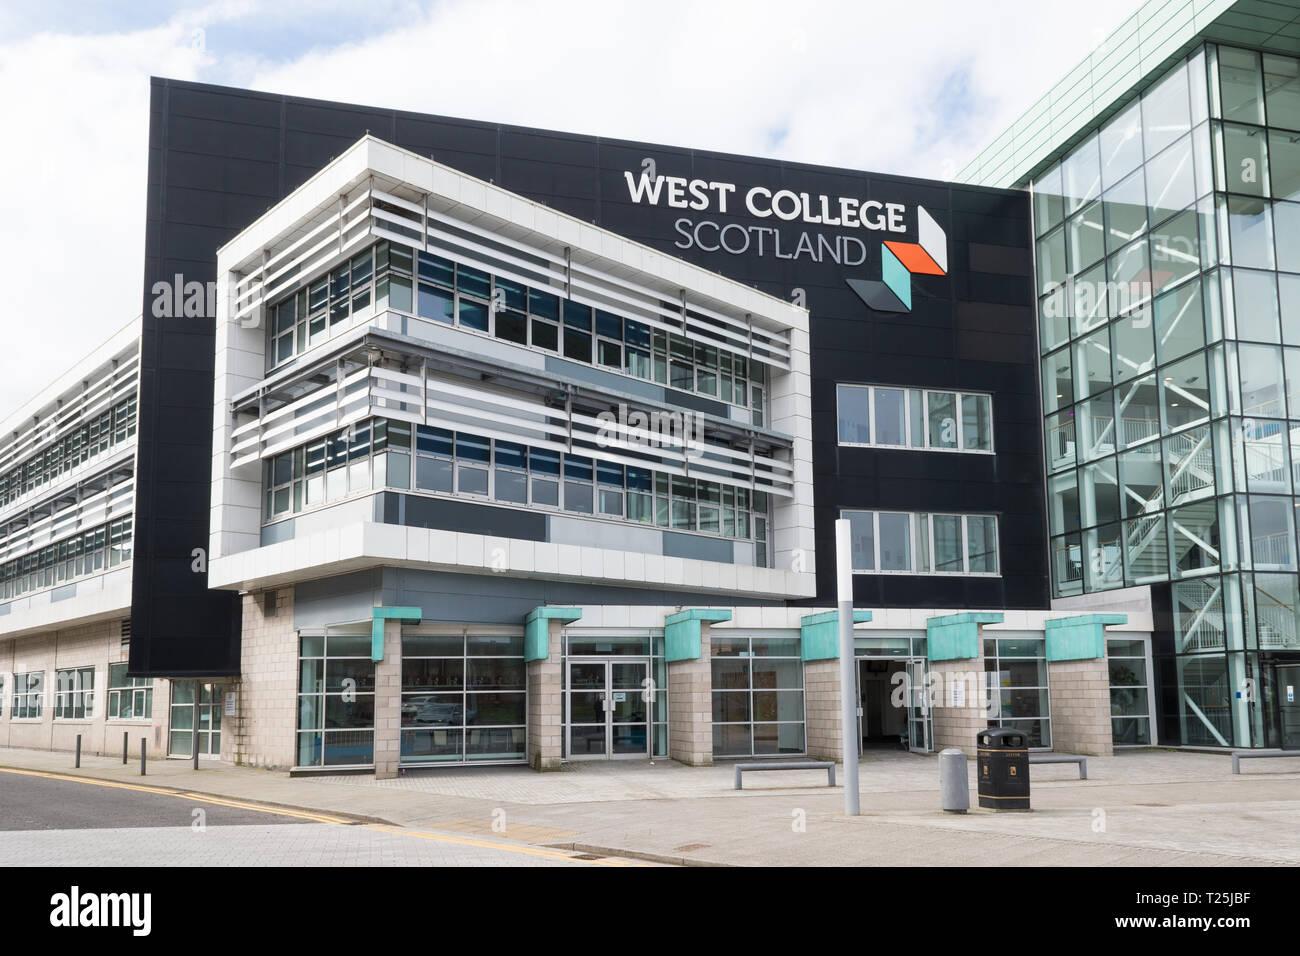 West College Scotland, Clydebank campus, Queen's Quay, Clydebank, Scotland, UK Stock Photo